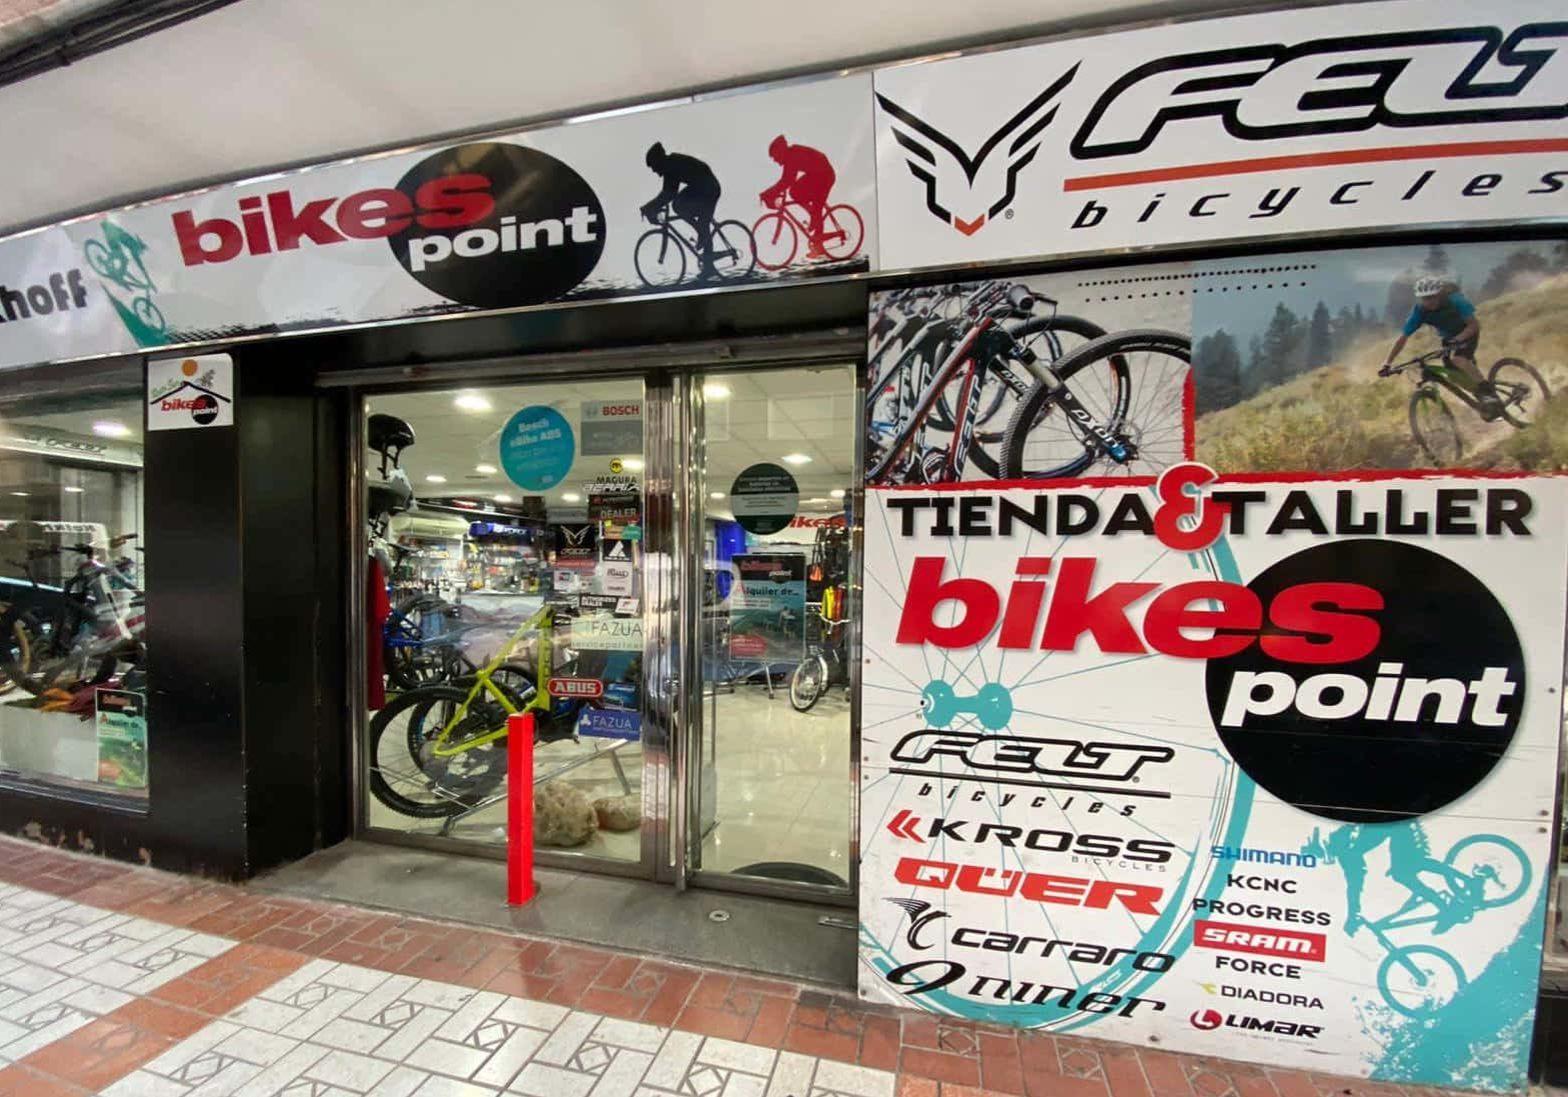 Bikes point fachada